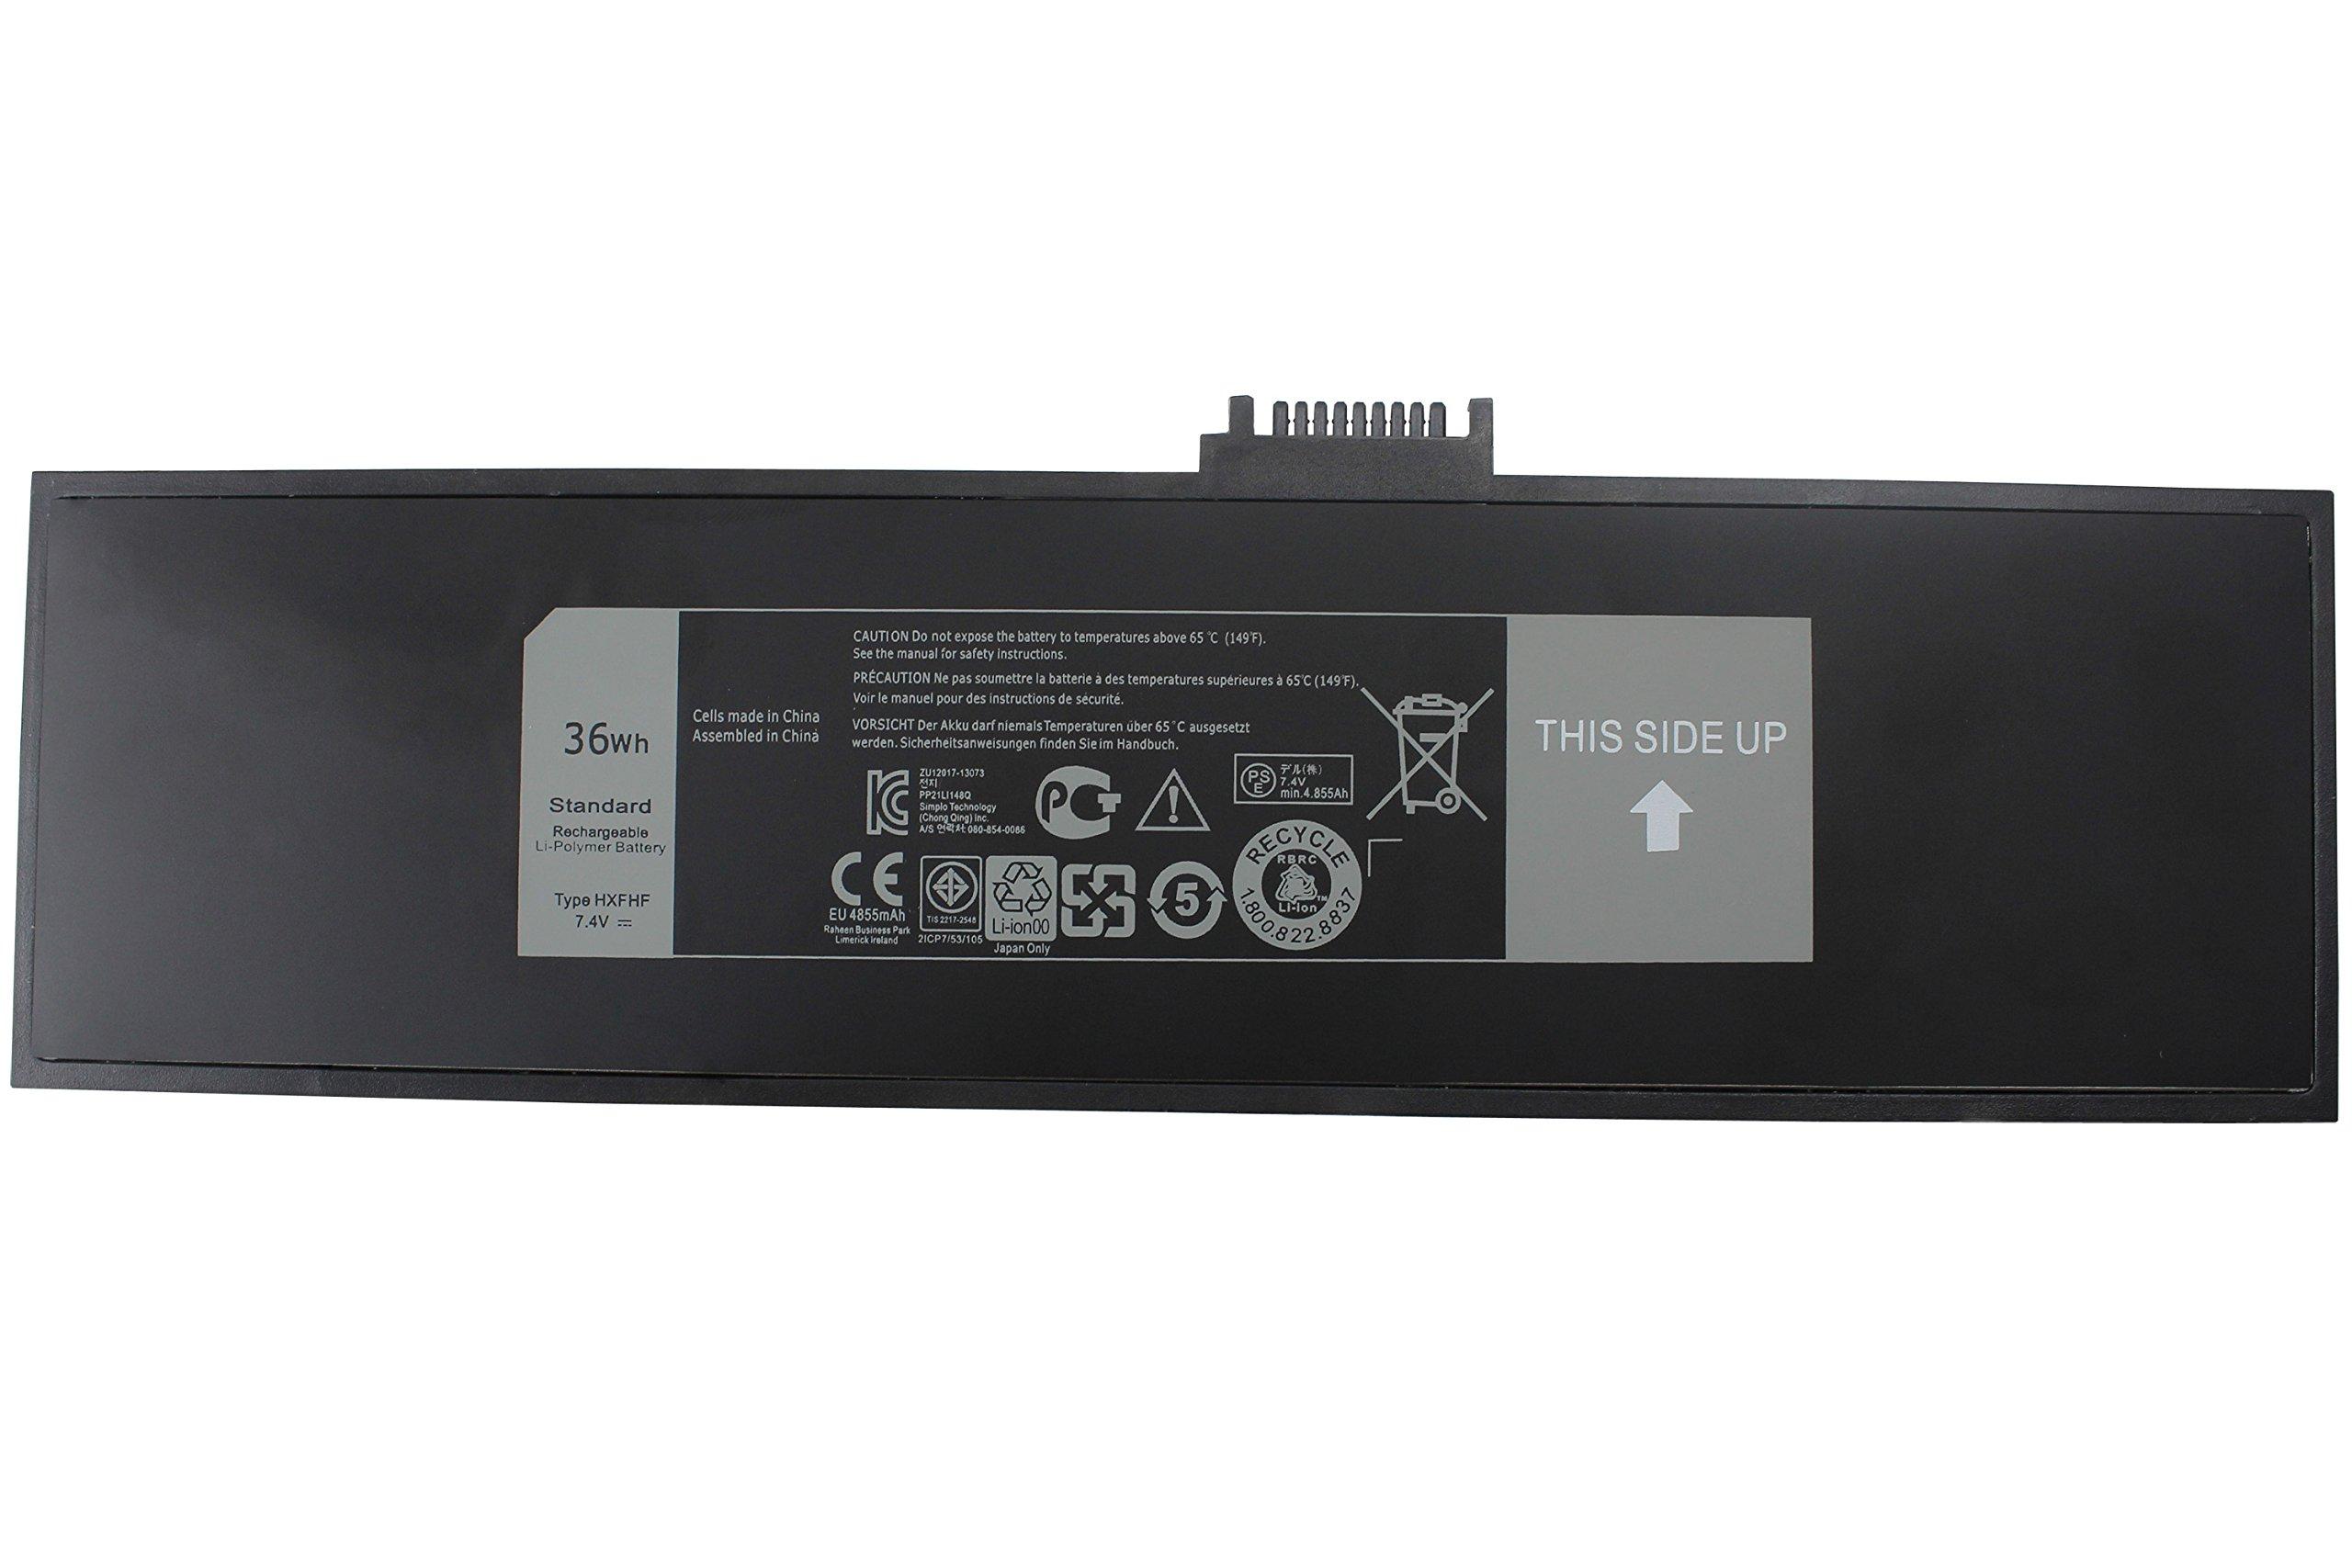 FLYTEN NEW HXFHF VJF0X Laptop Battery For Dell Venue 11 Pro 7130,Venue 11 Pro 7130 Tablet,Venue 11 Pro 7139,Venue 11 Pro 7140 Series 12 Months Warranty